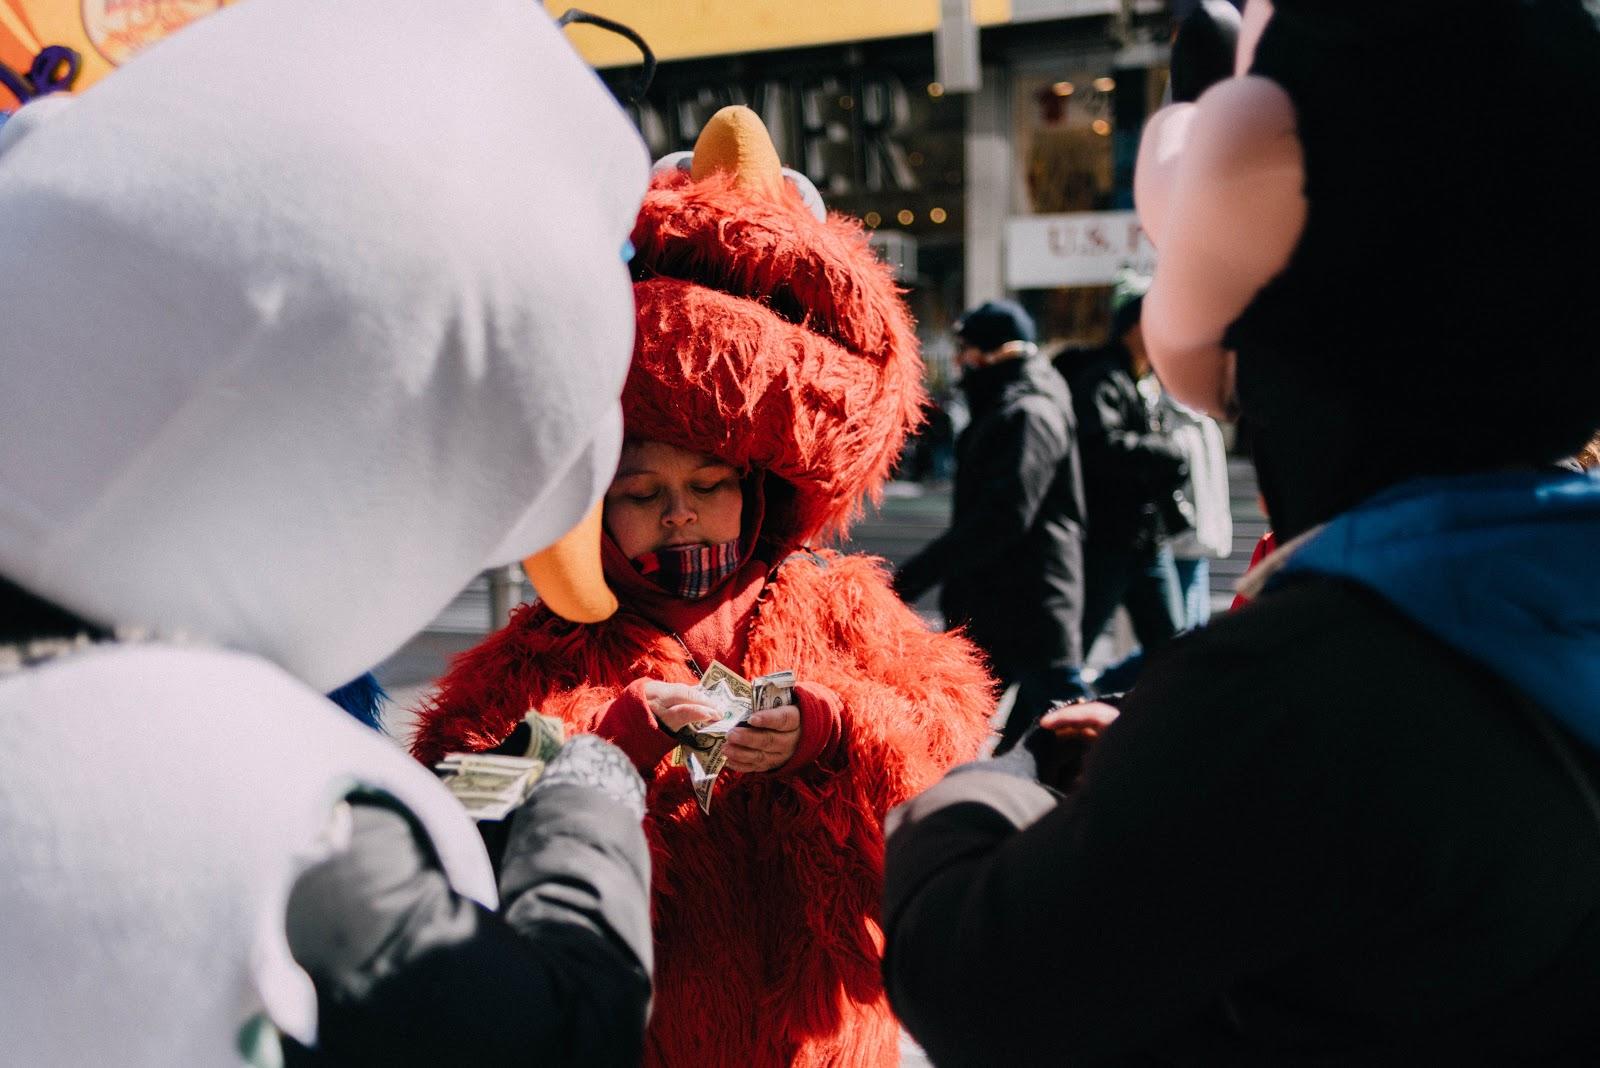 Autism on Sesame street (How it helped)